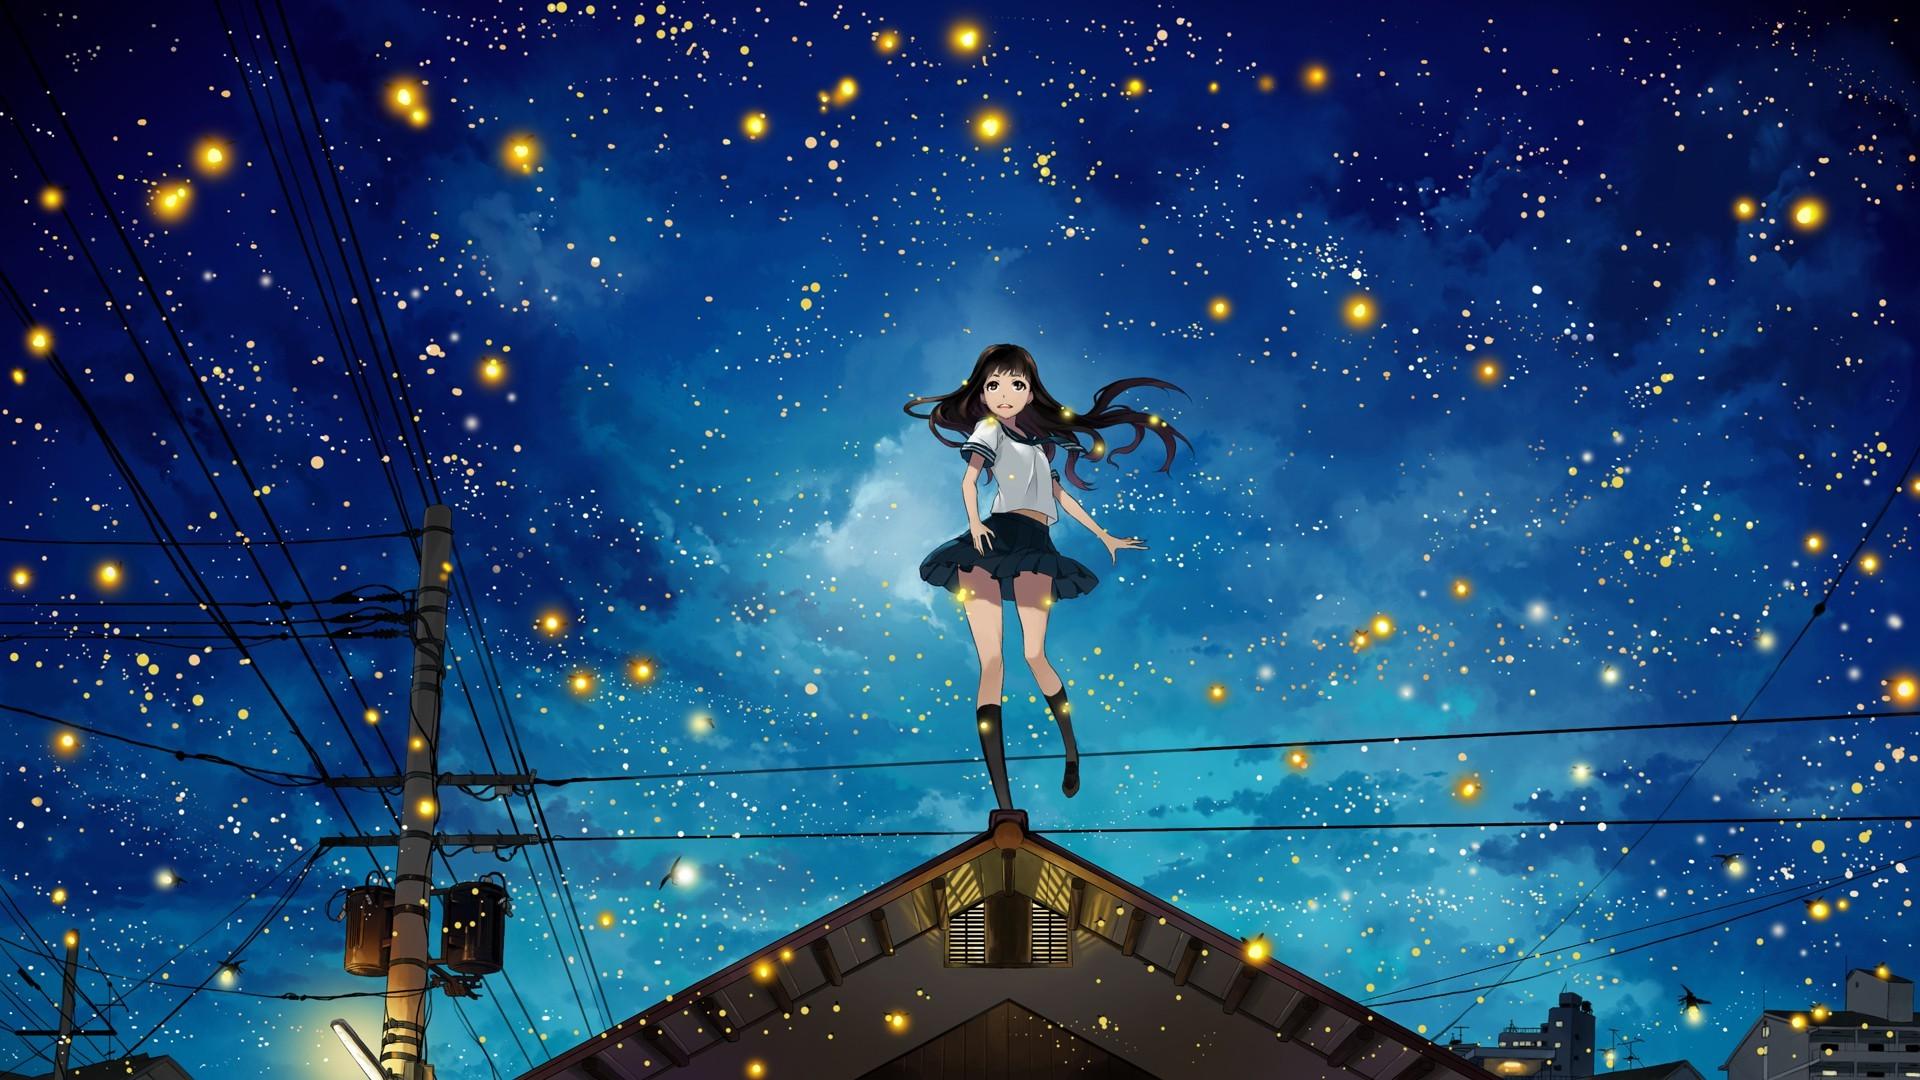 night Power Lines Rooftops Stars Anime Girls Original 1920x1080